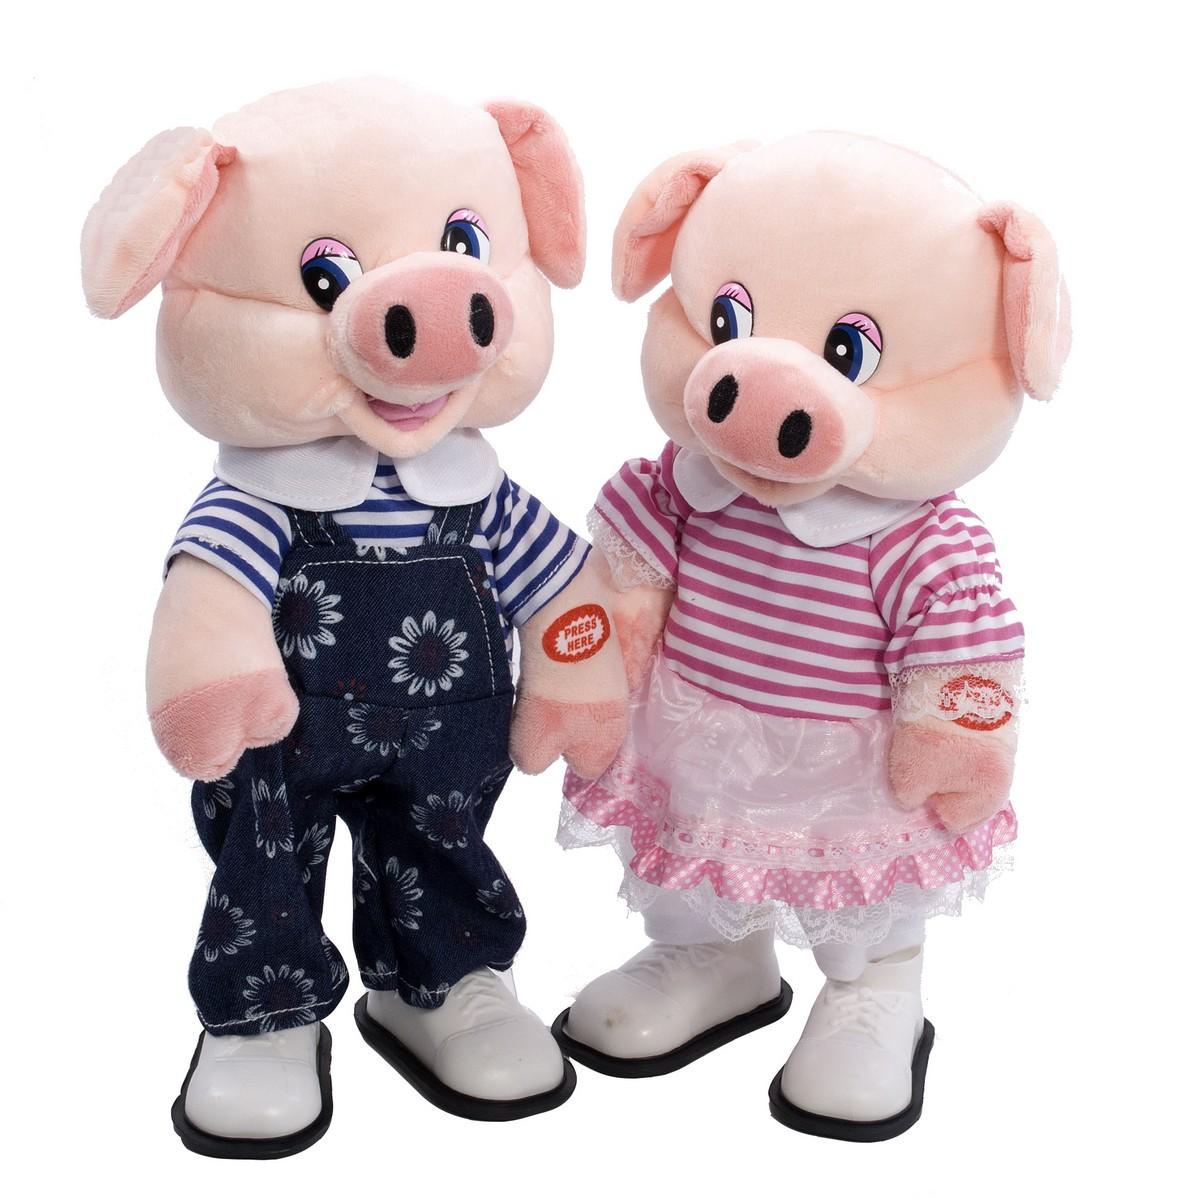 мягкая игрушка свинка